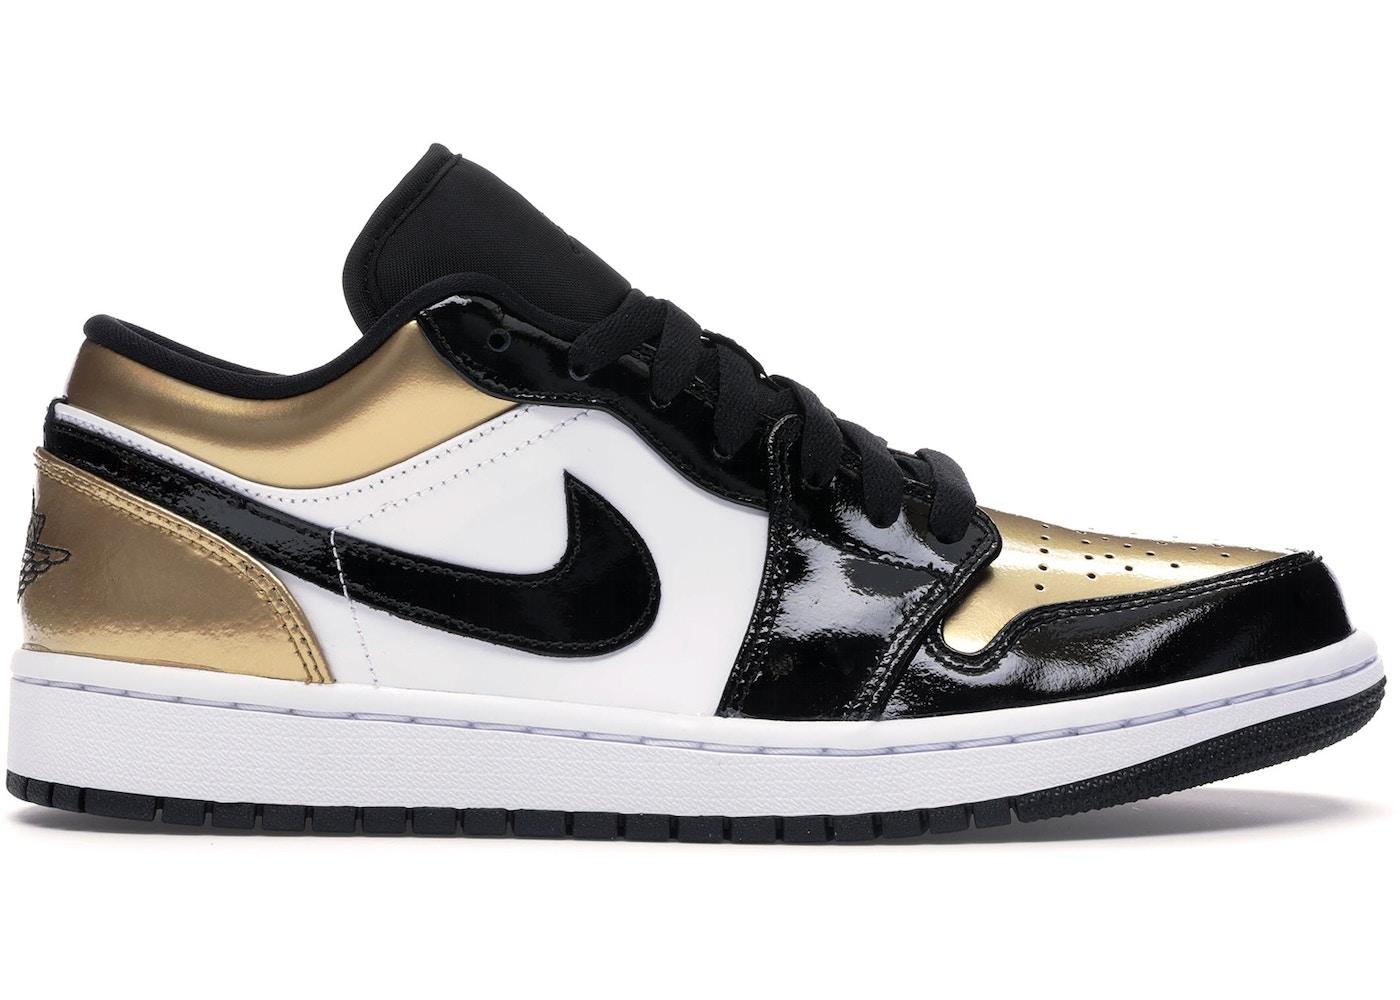 the latest 53818 02c2f Buy Air Jordan 1 Shoes & Deadstock Sneakers